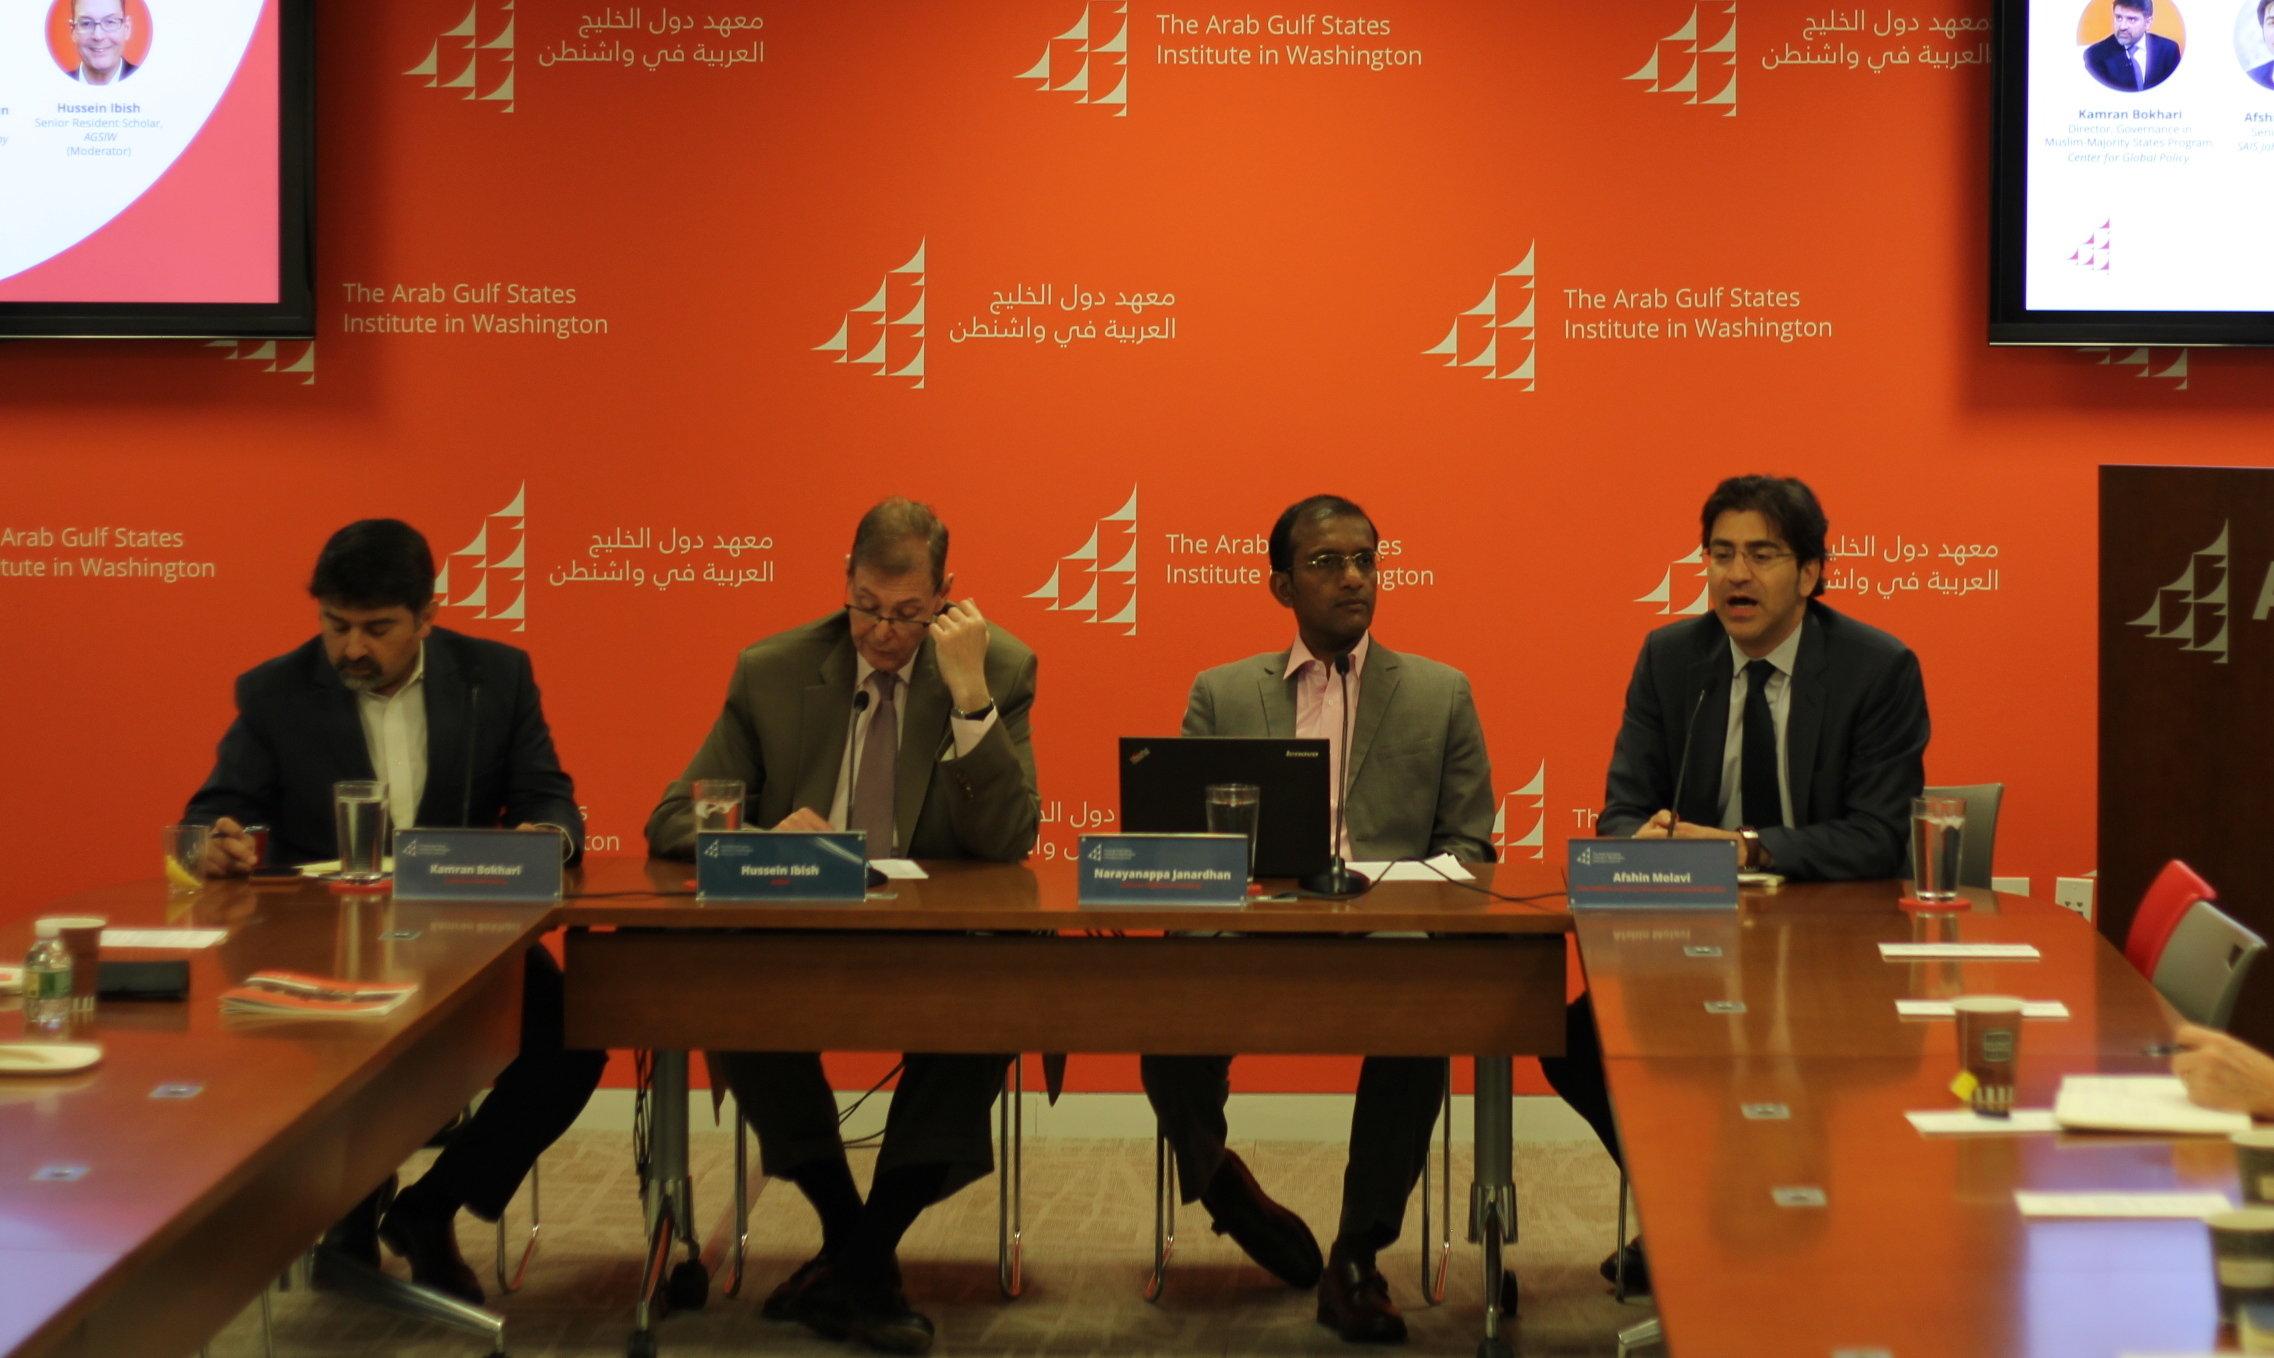 GCC-South Asia panel